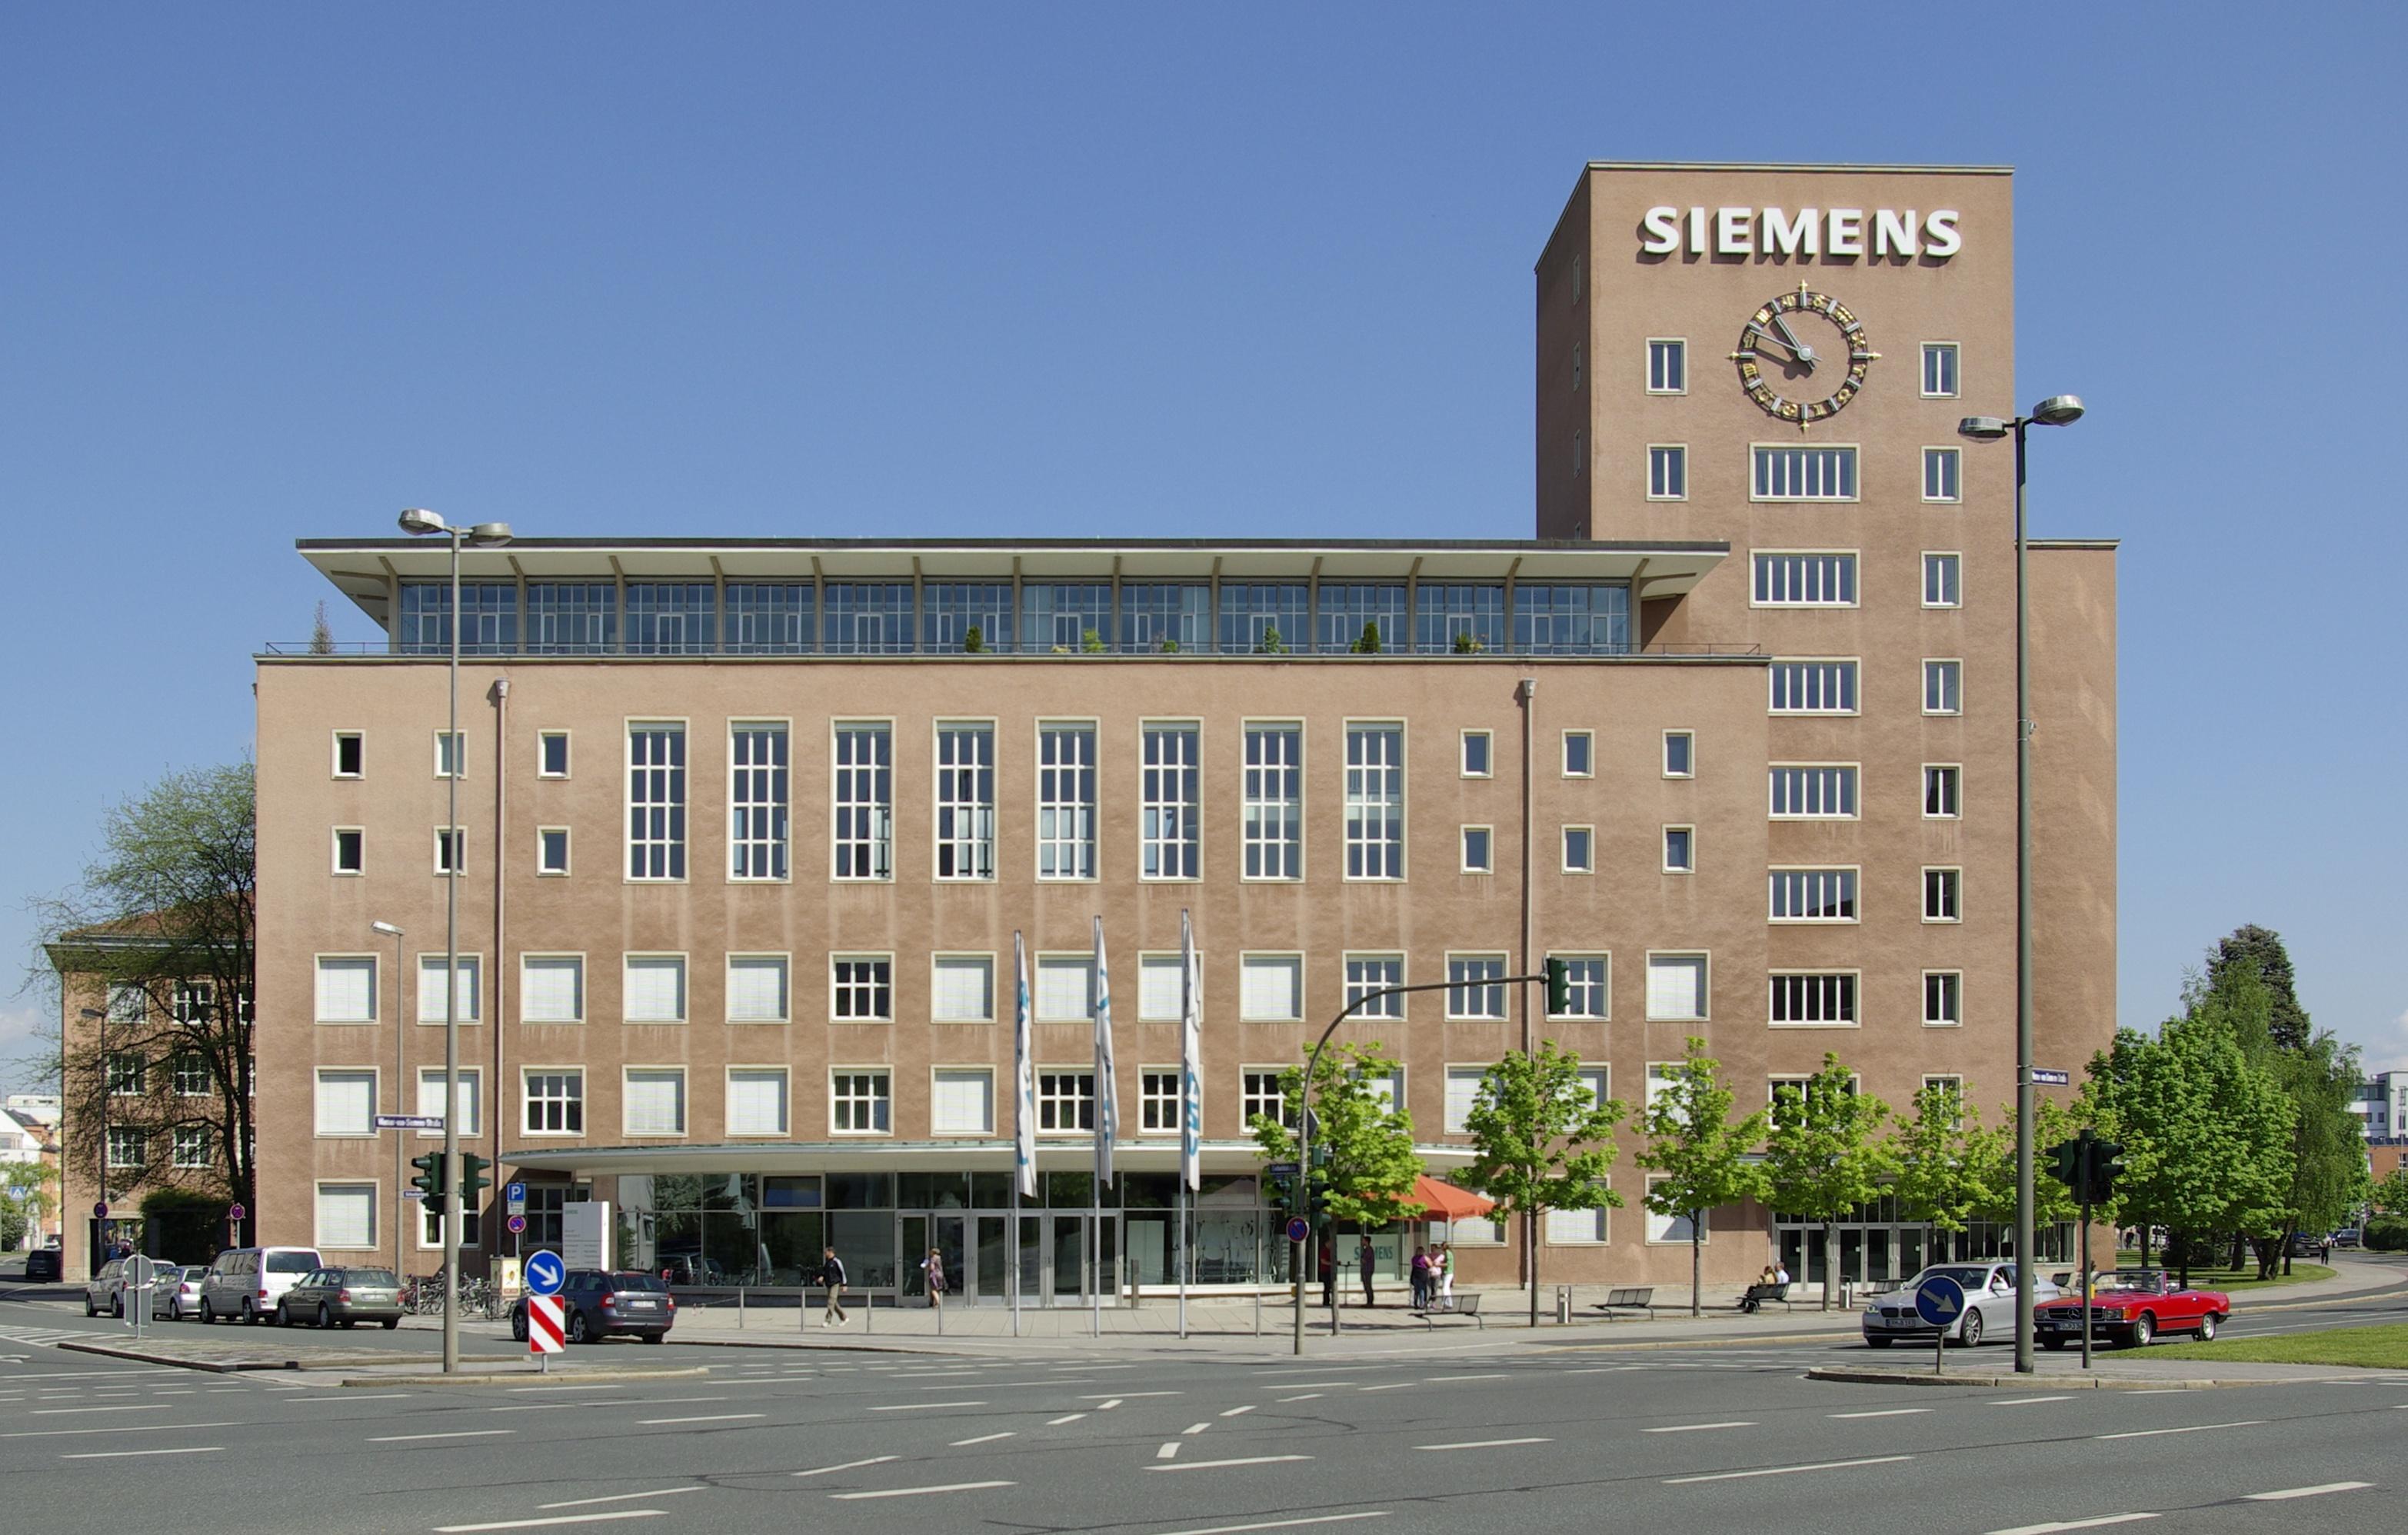 Siemens – Wikipedia